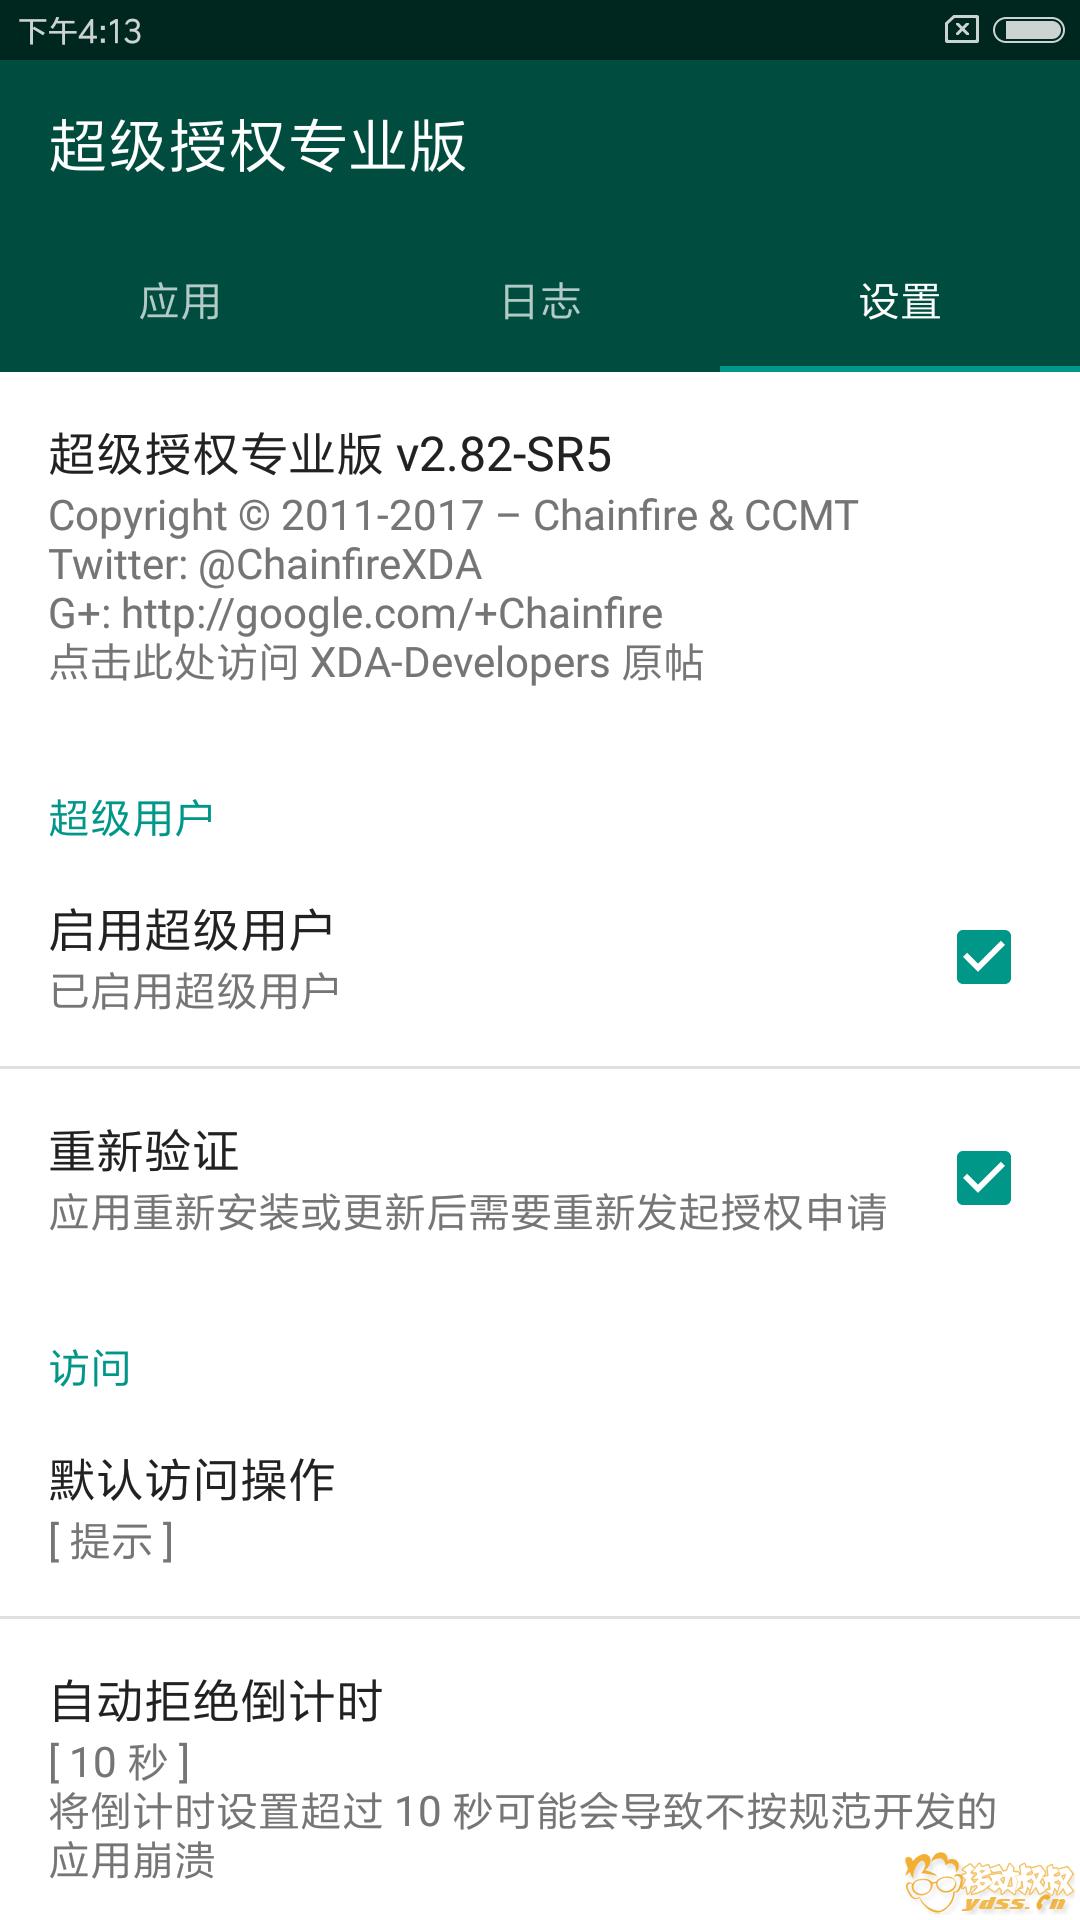 Screenshot_2018-01-13-16-13-40-792_eu.chainfire.supersu.png